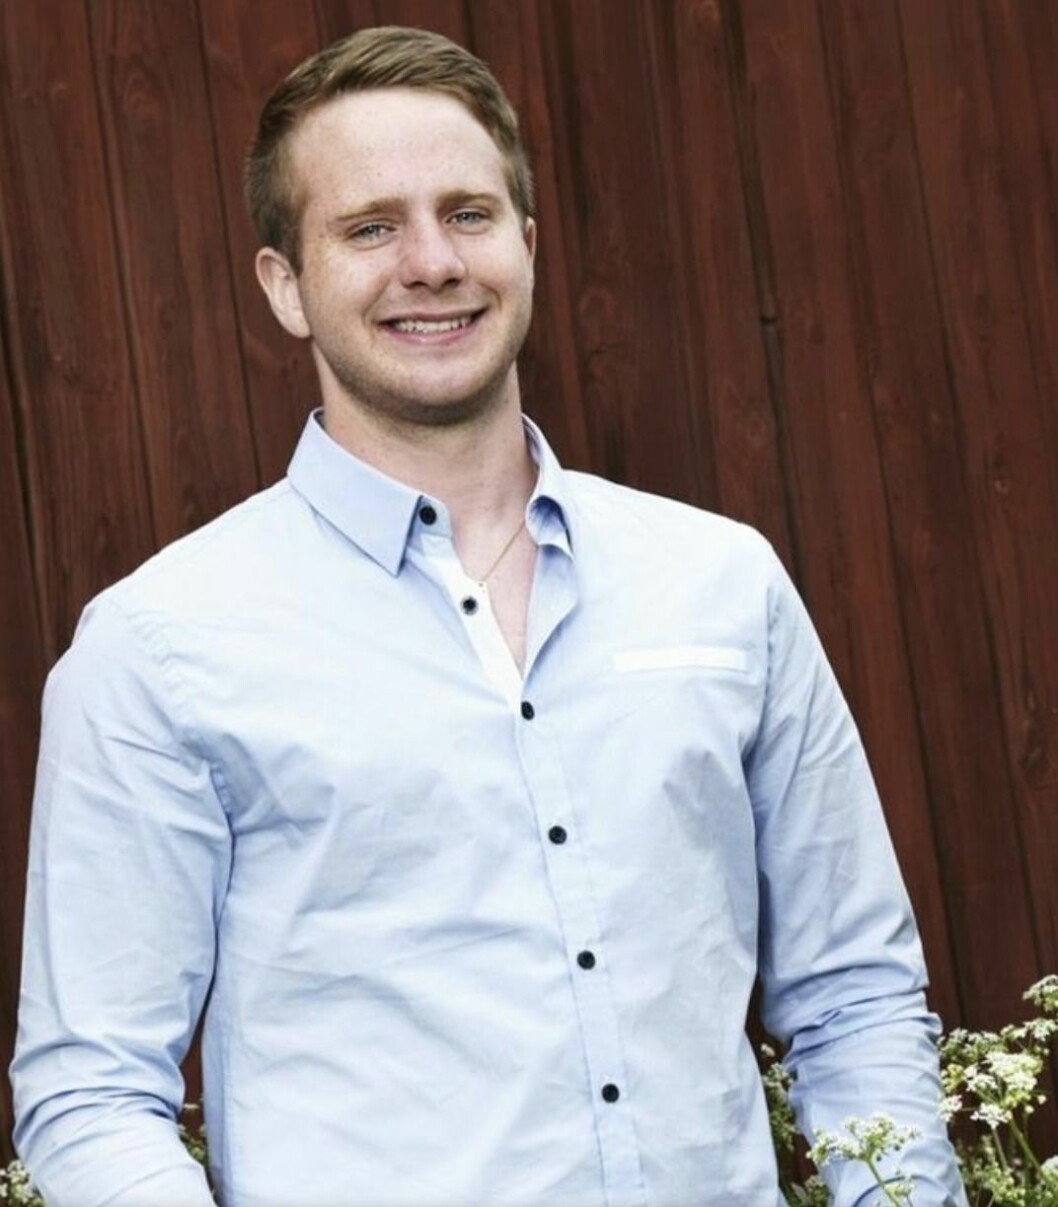 Erik Bäckman i Bonde söker fru